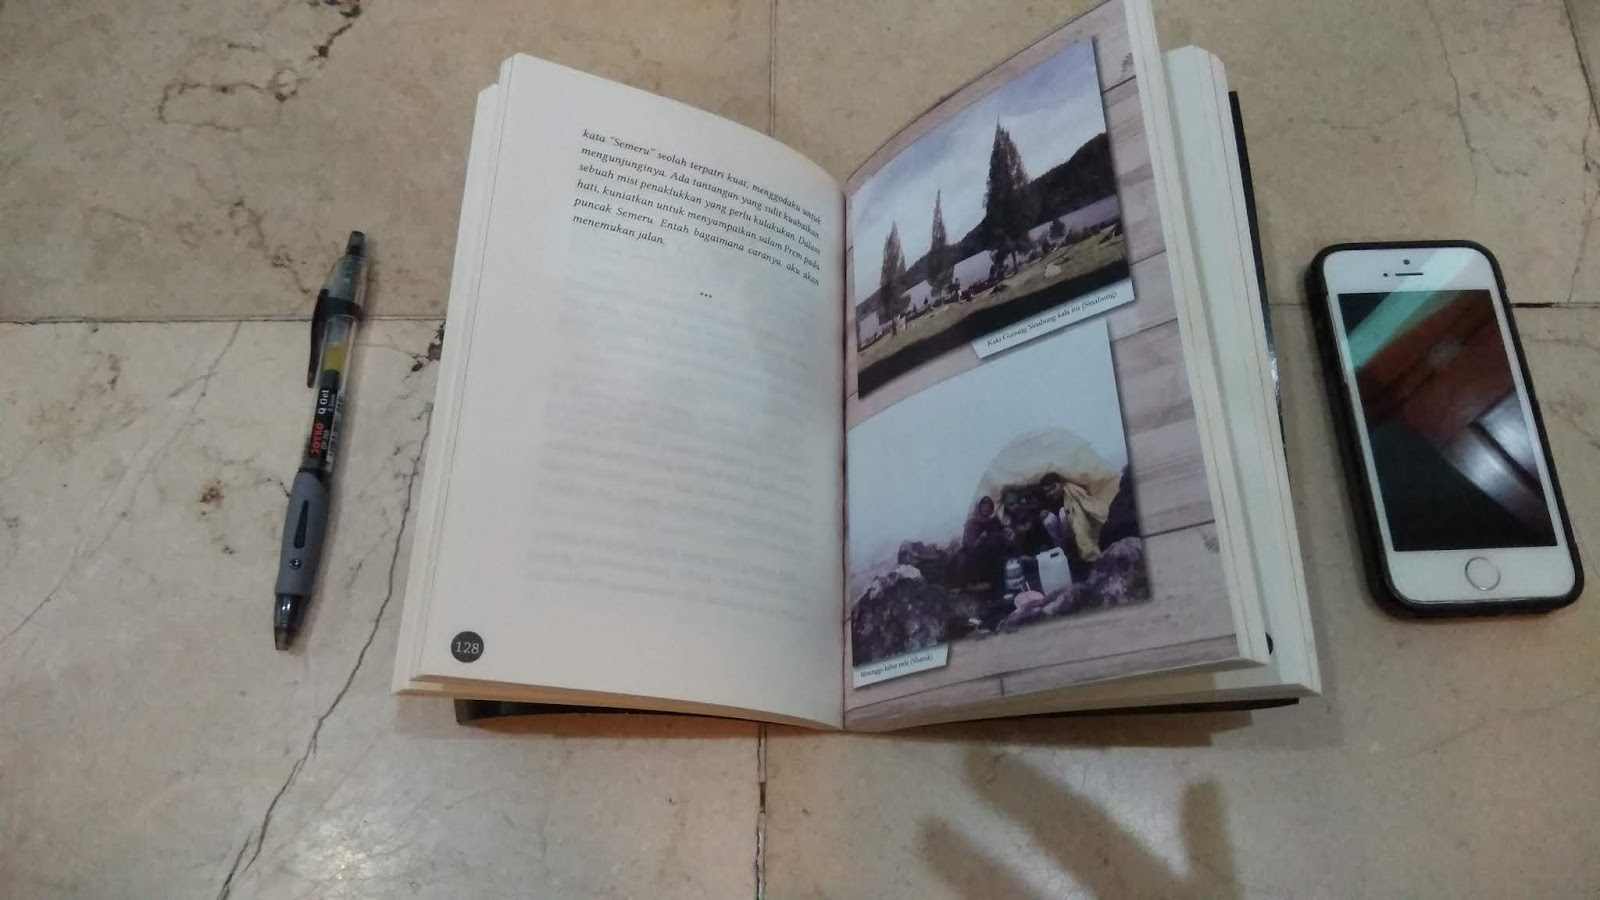 Arah Langkah Fiersa Besari Nur Muhammad Luthfi Salah Satu Foto Yang Ada Di Buku Ini